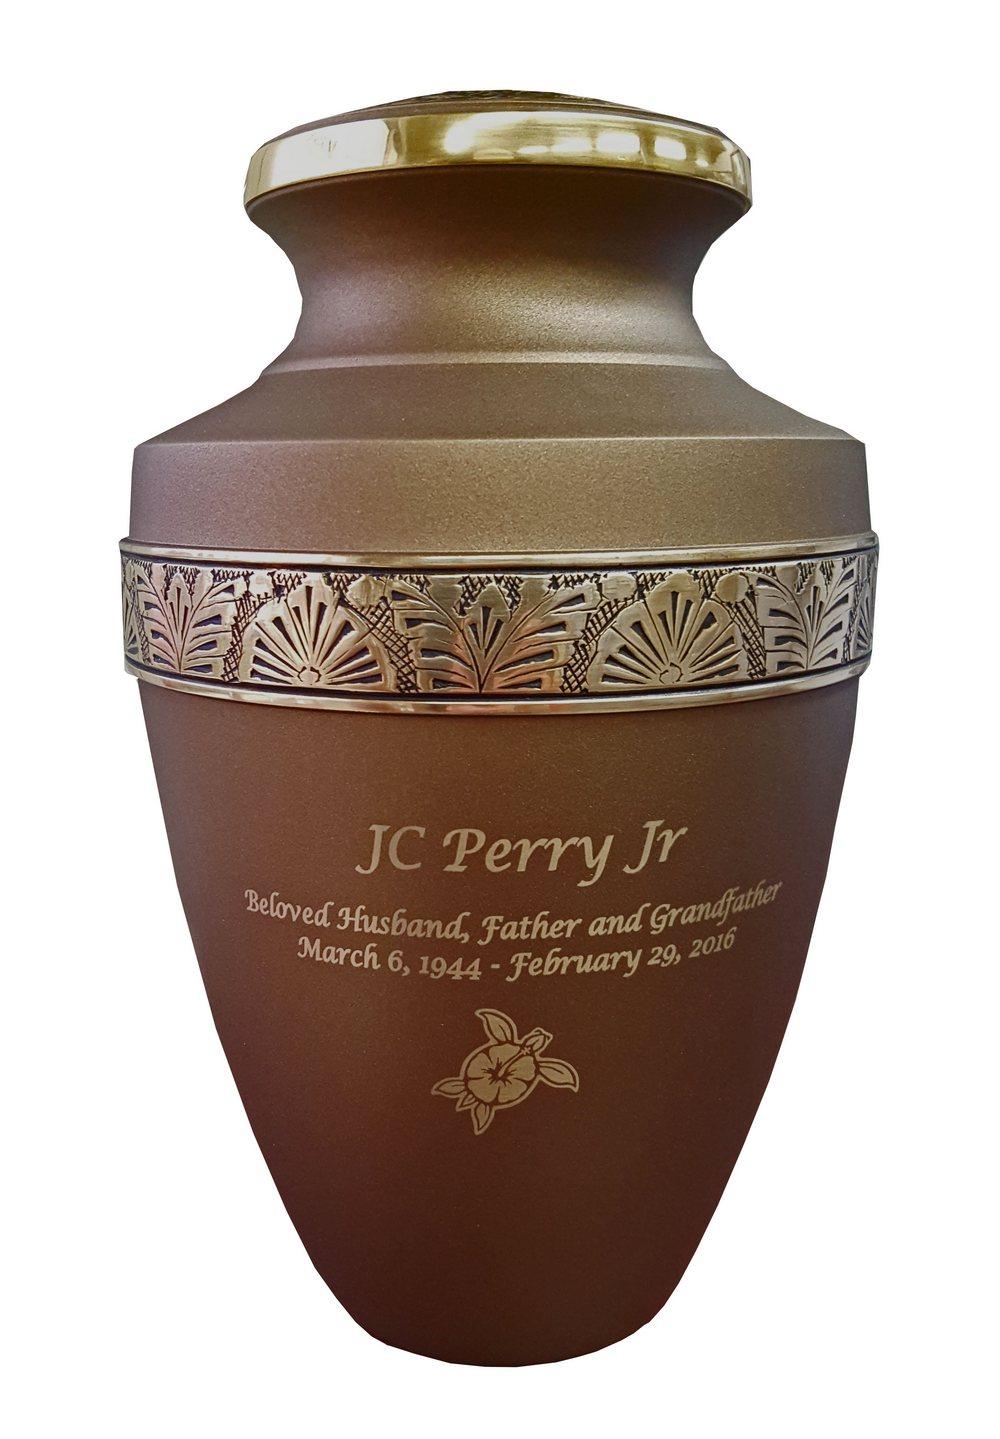 Chestnut Brass Cremation Urn Floral Band Memorial Urns